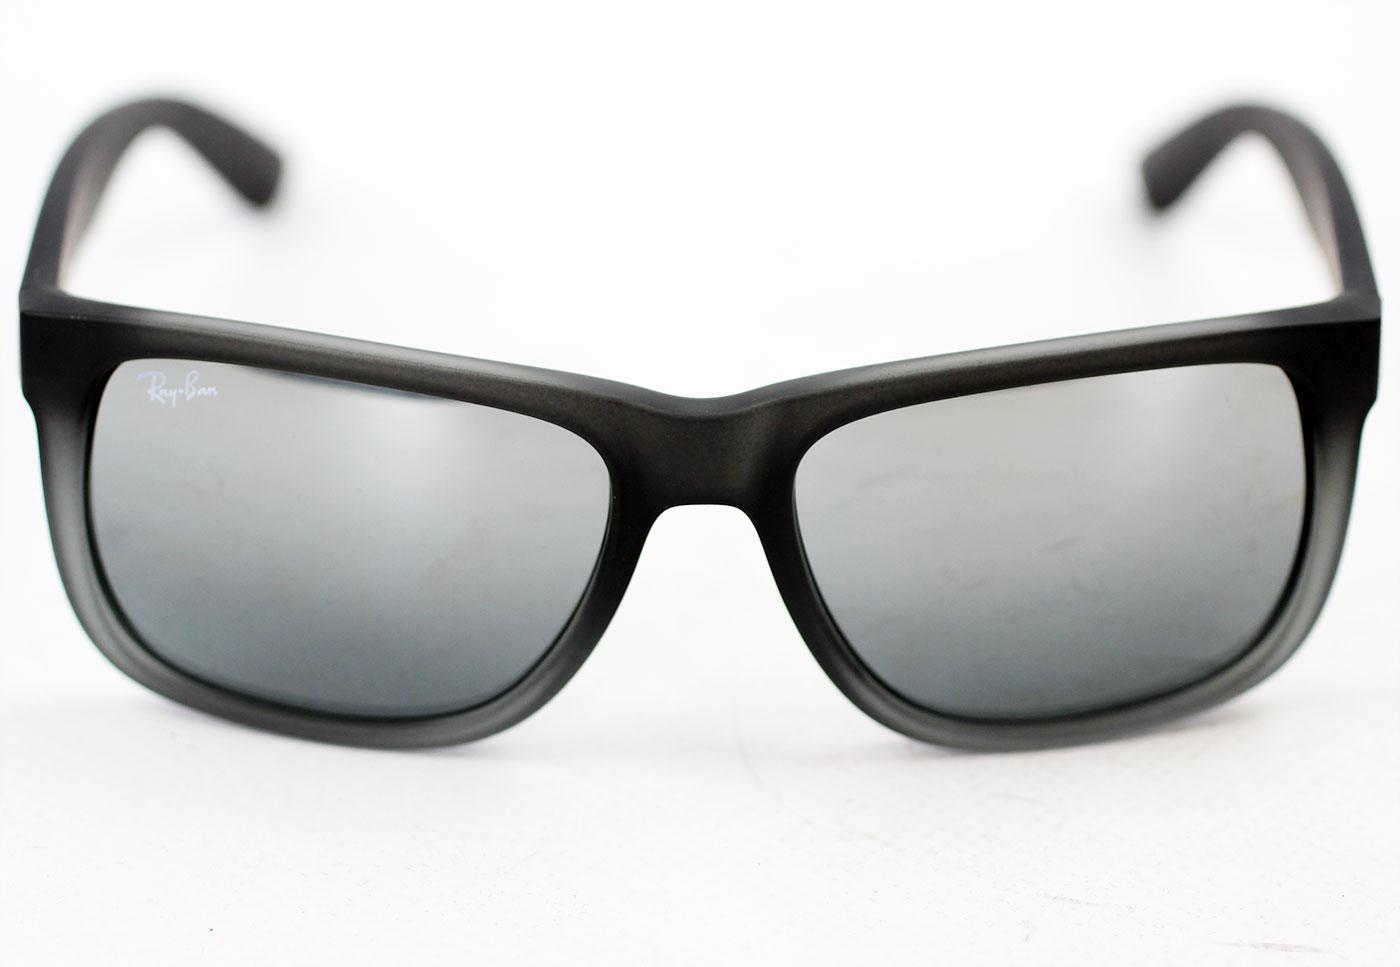 Ray-Ban Justin RB4165 Retro Wayfarer Sunglasses